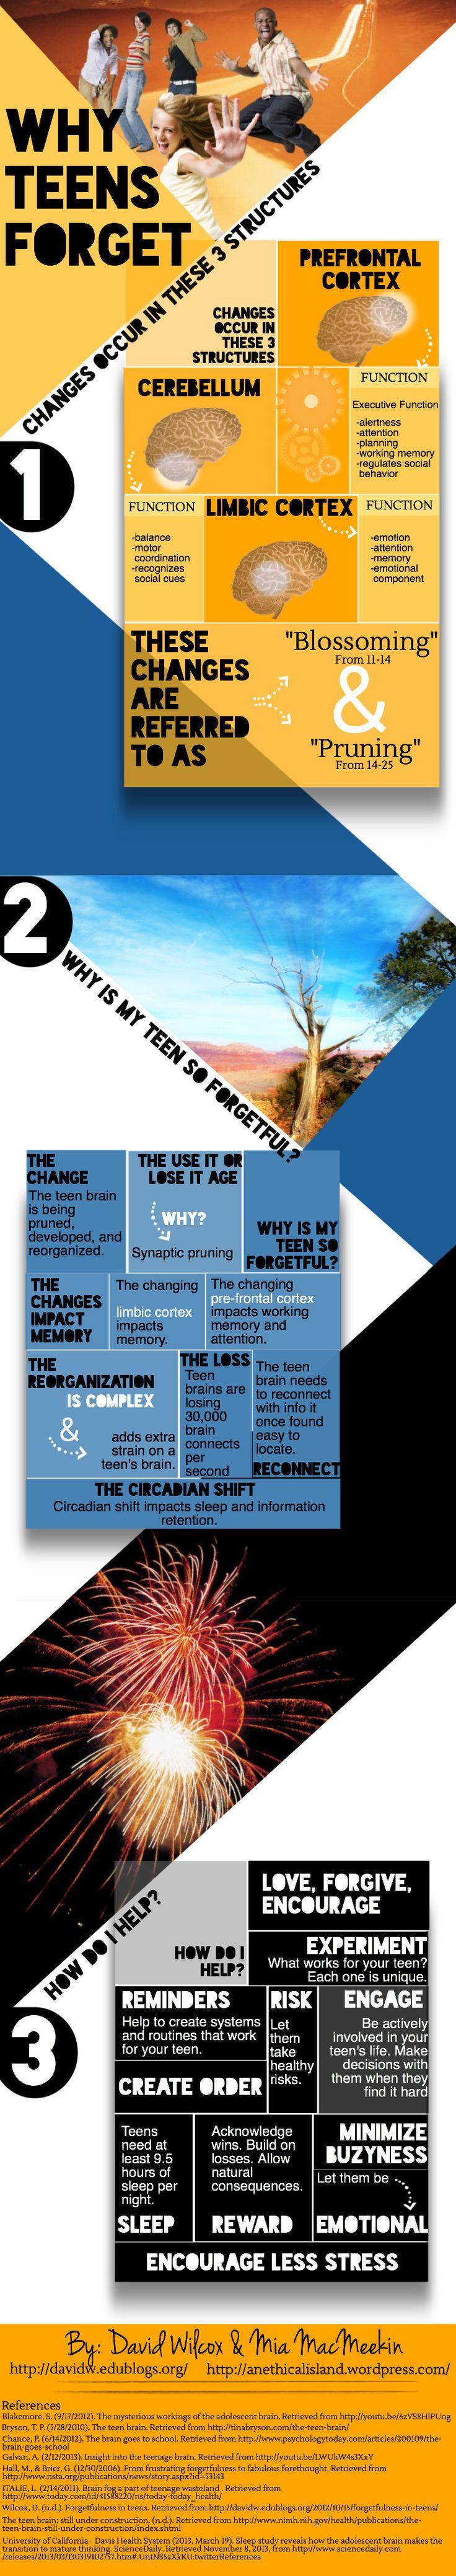 Why is my teen so forgetful? | An inforgraphic from Mia Macmeekin http://anethicalisland.wordpress.com